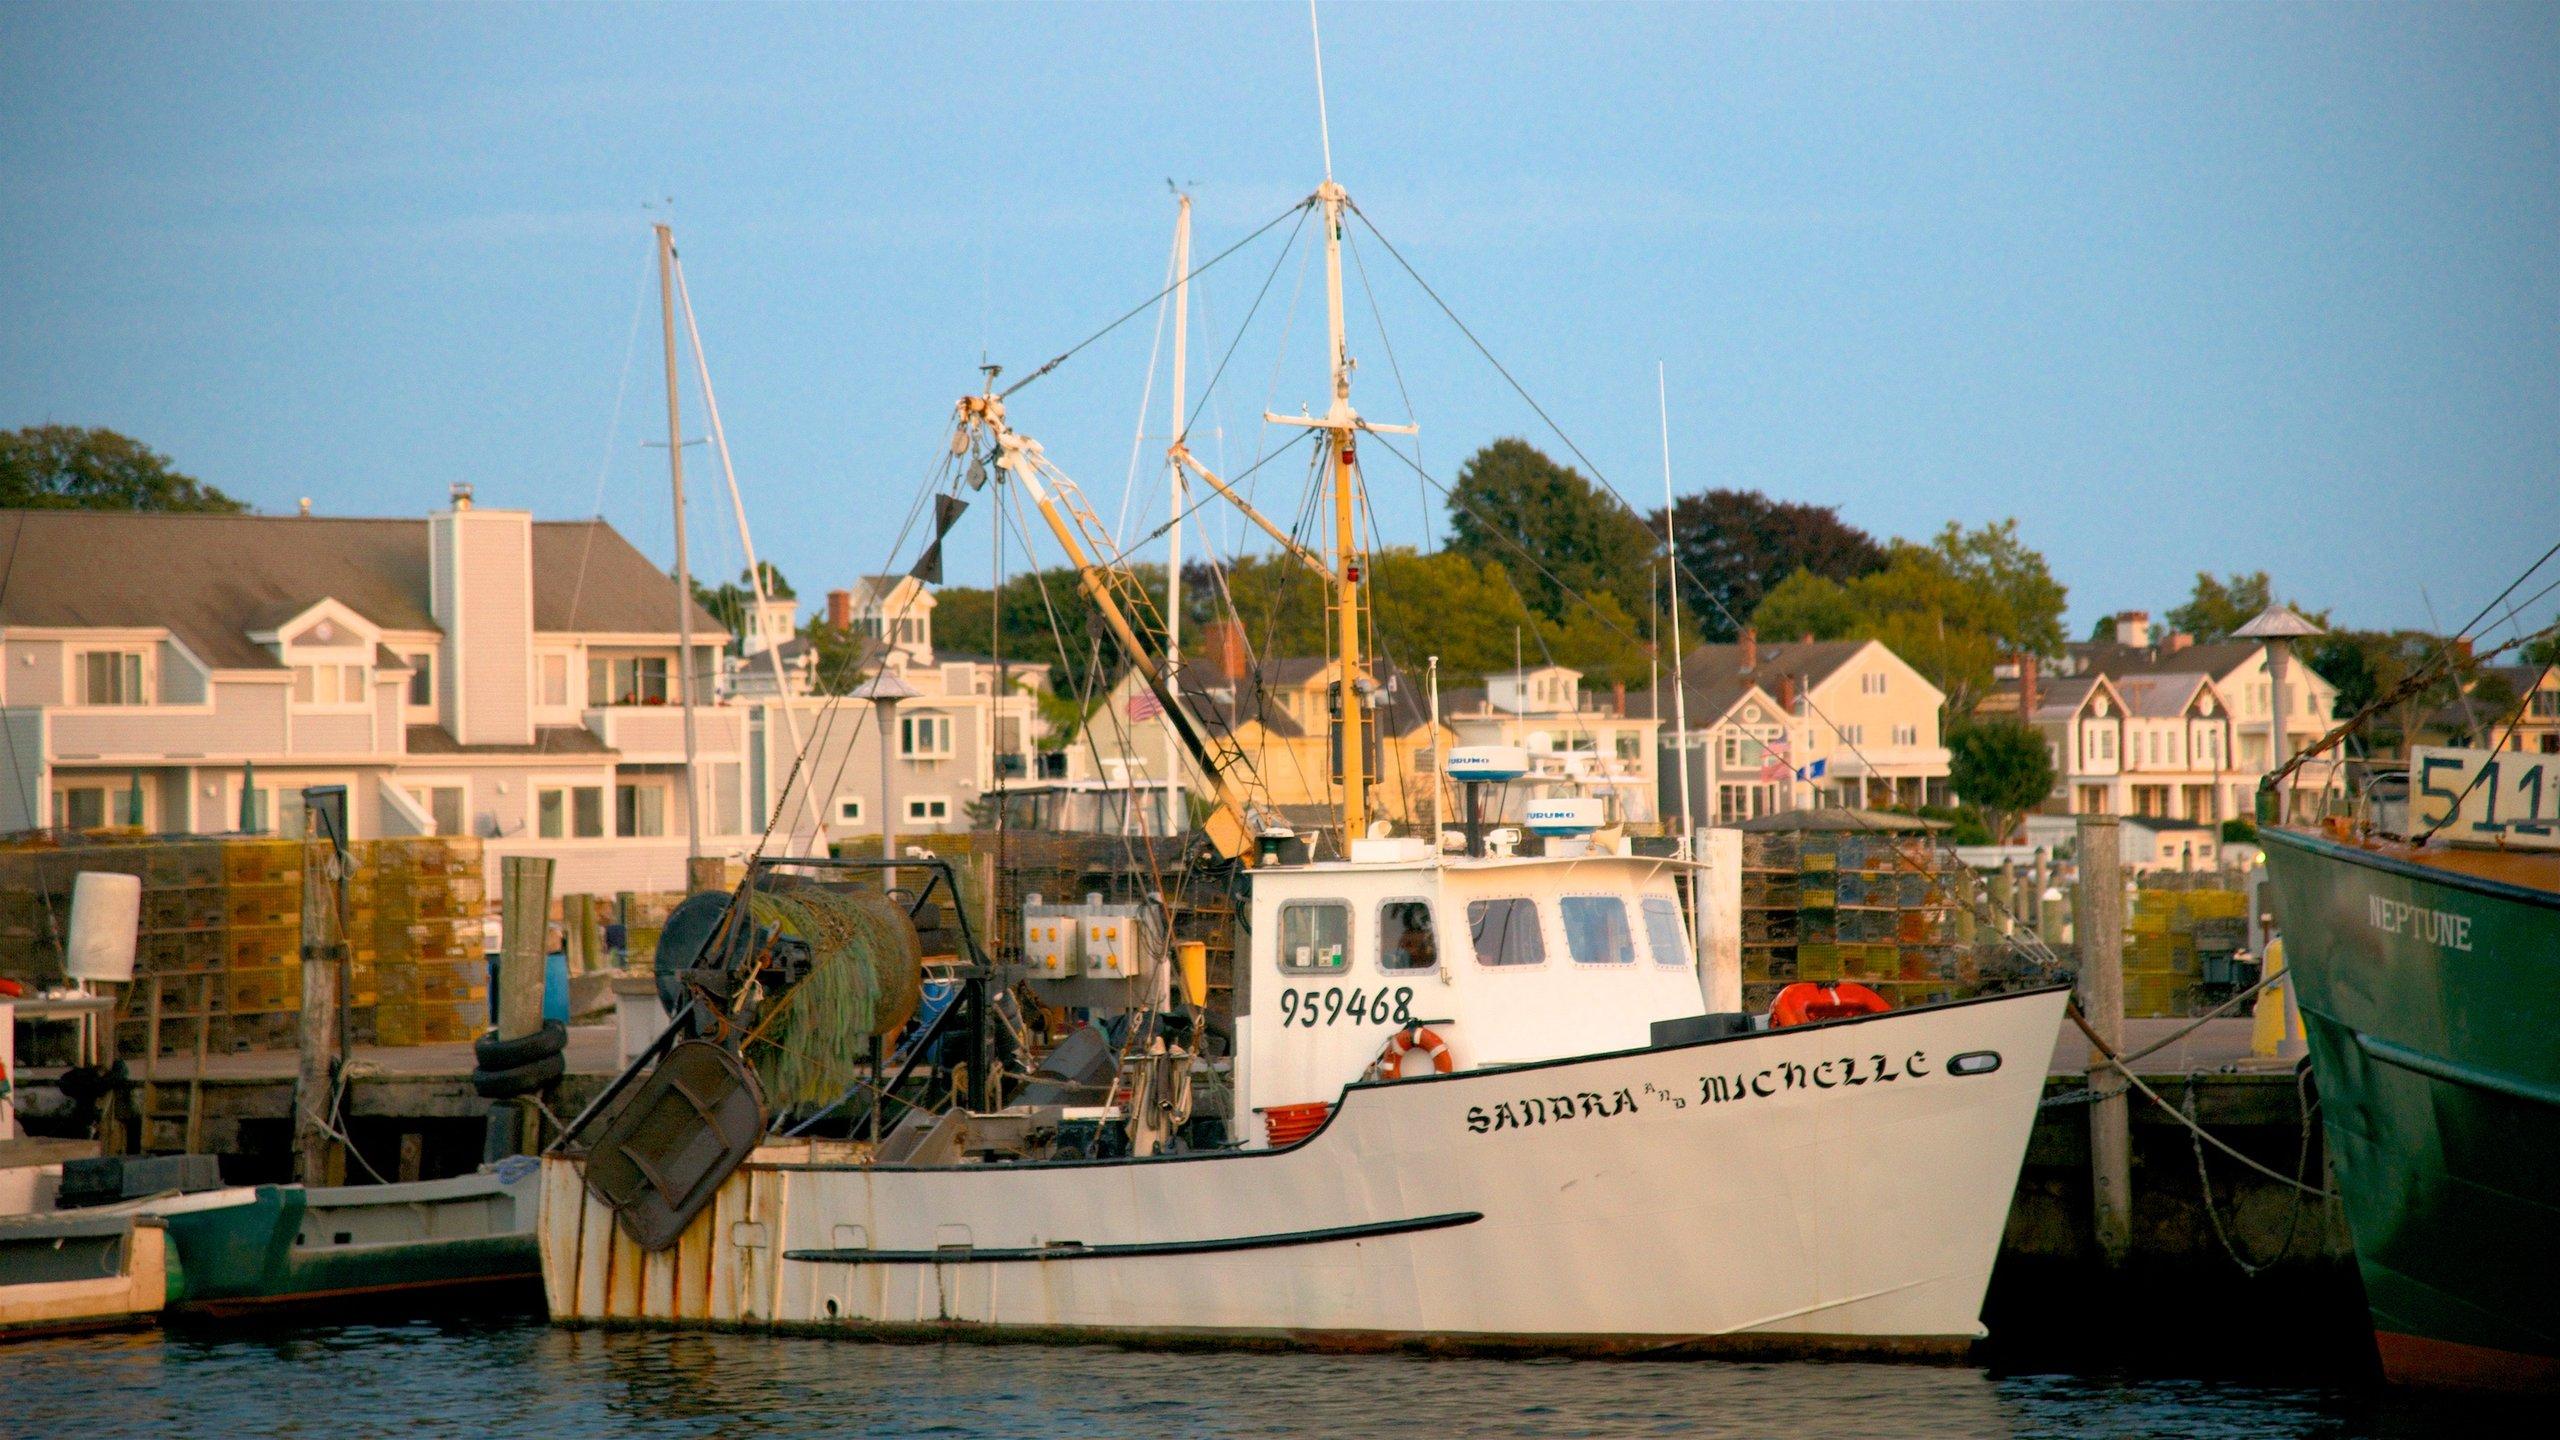 Stonington, Connecticut, United States of America